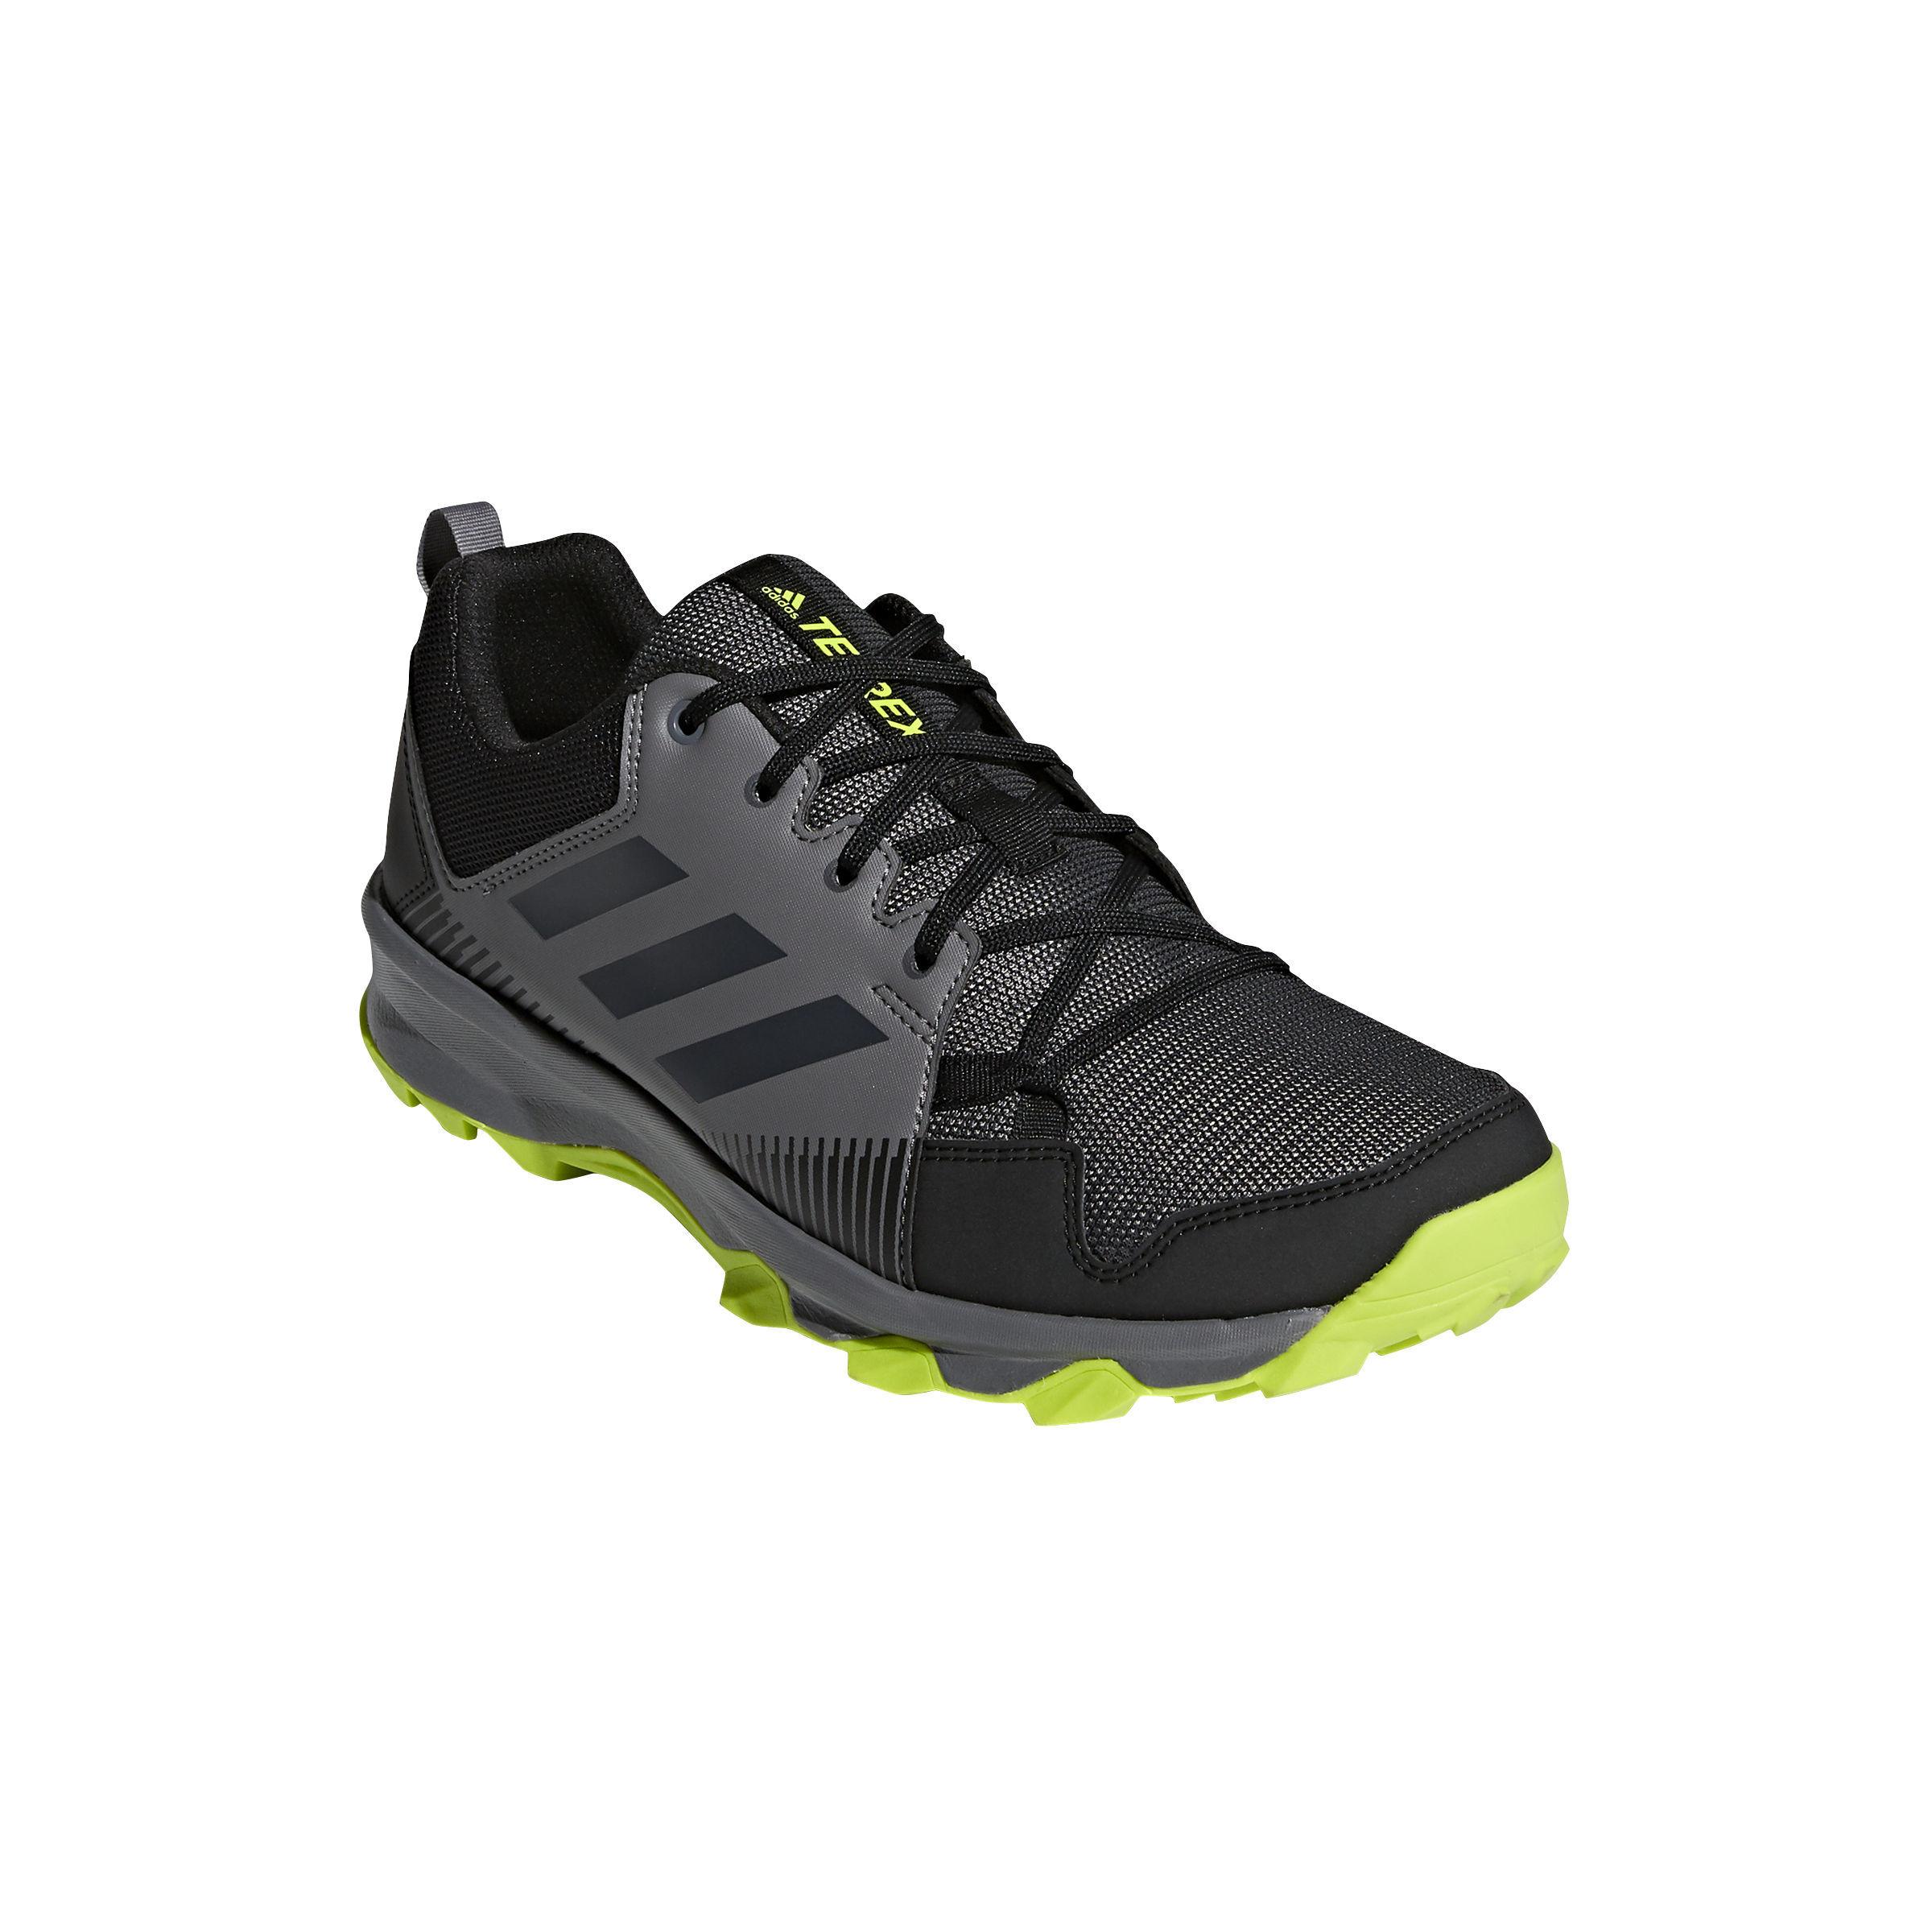 adidas Terrex Free Hiker Herren Schuhe Outlet, adidas